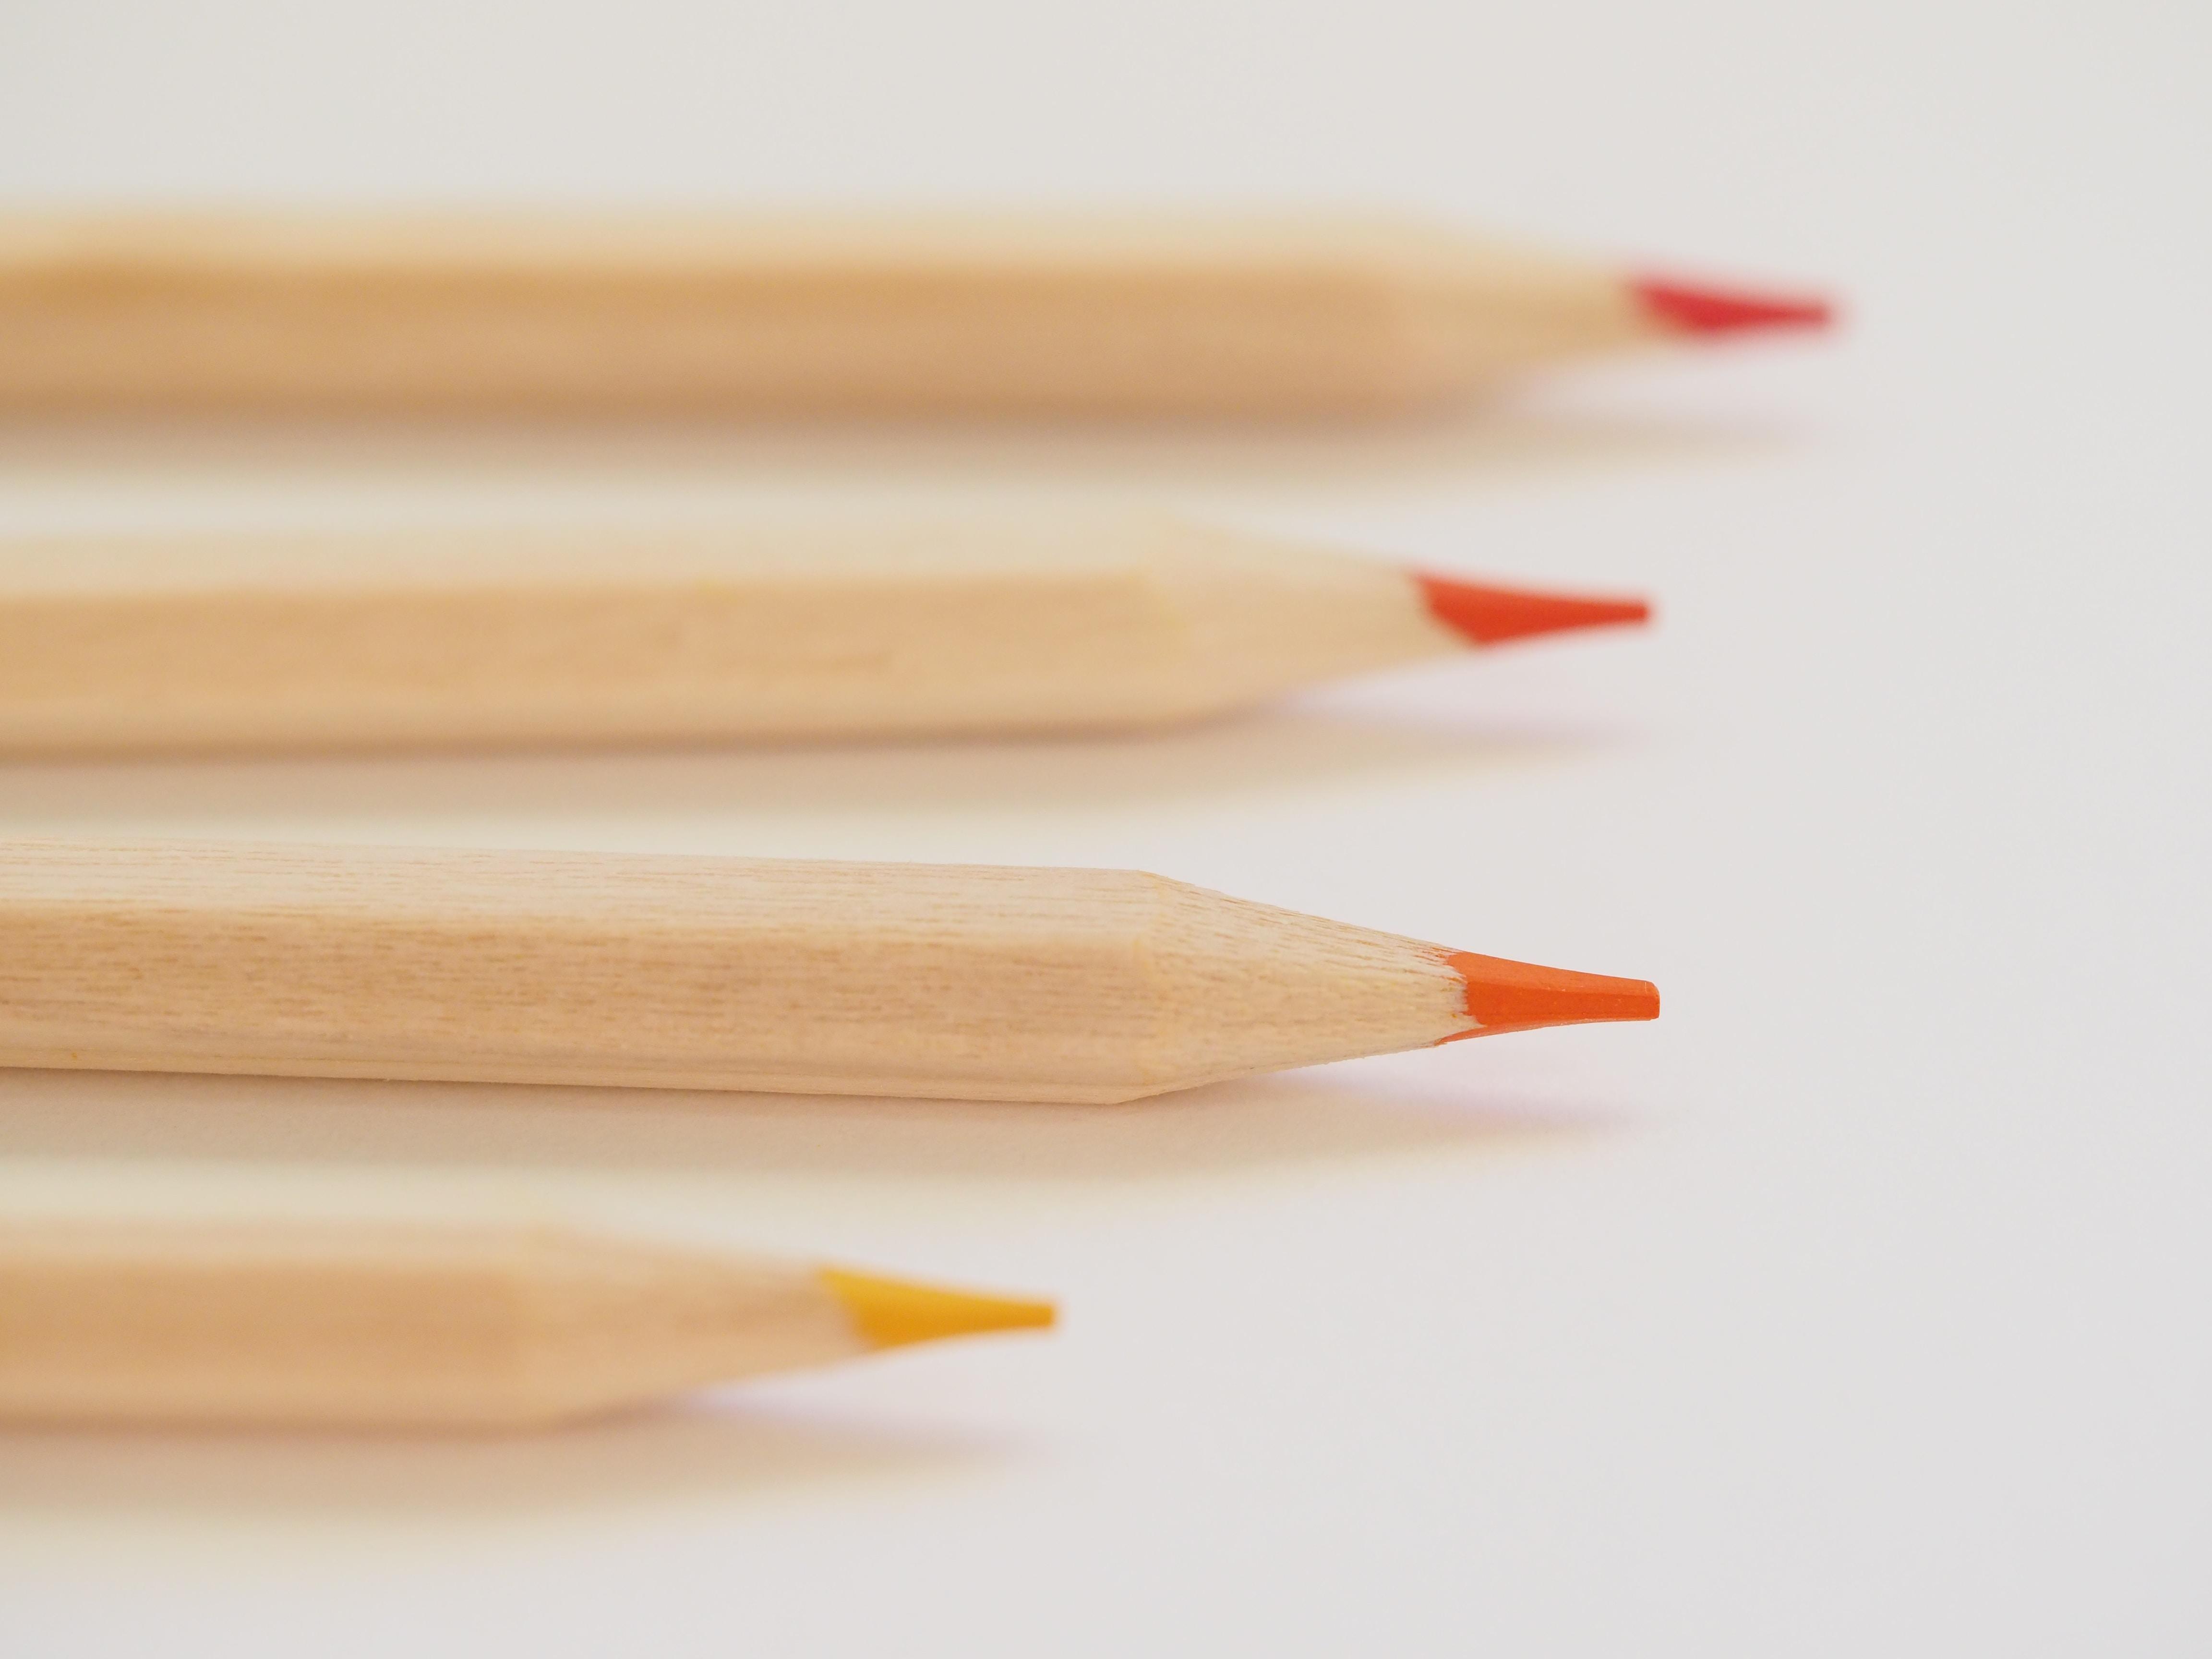 selective focus photo of color pencils